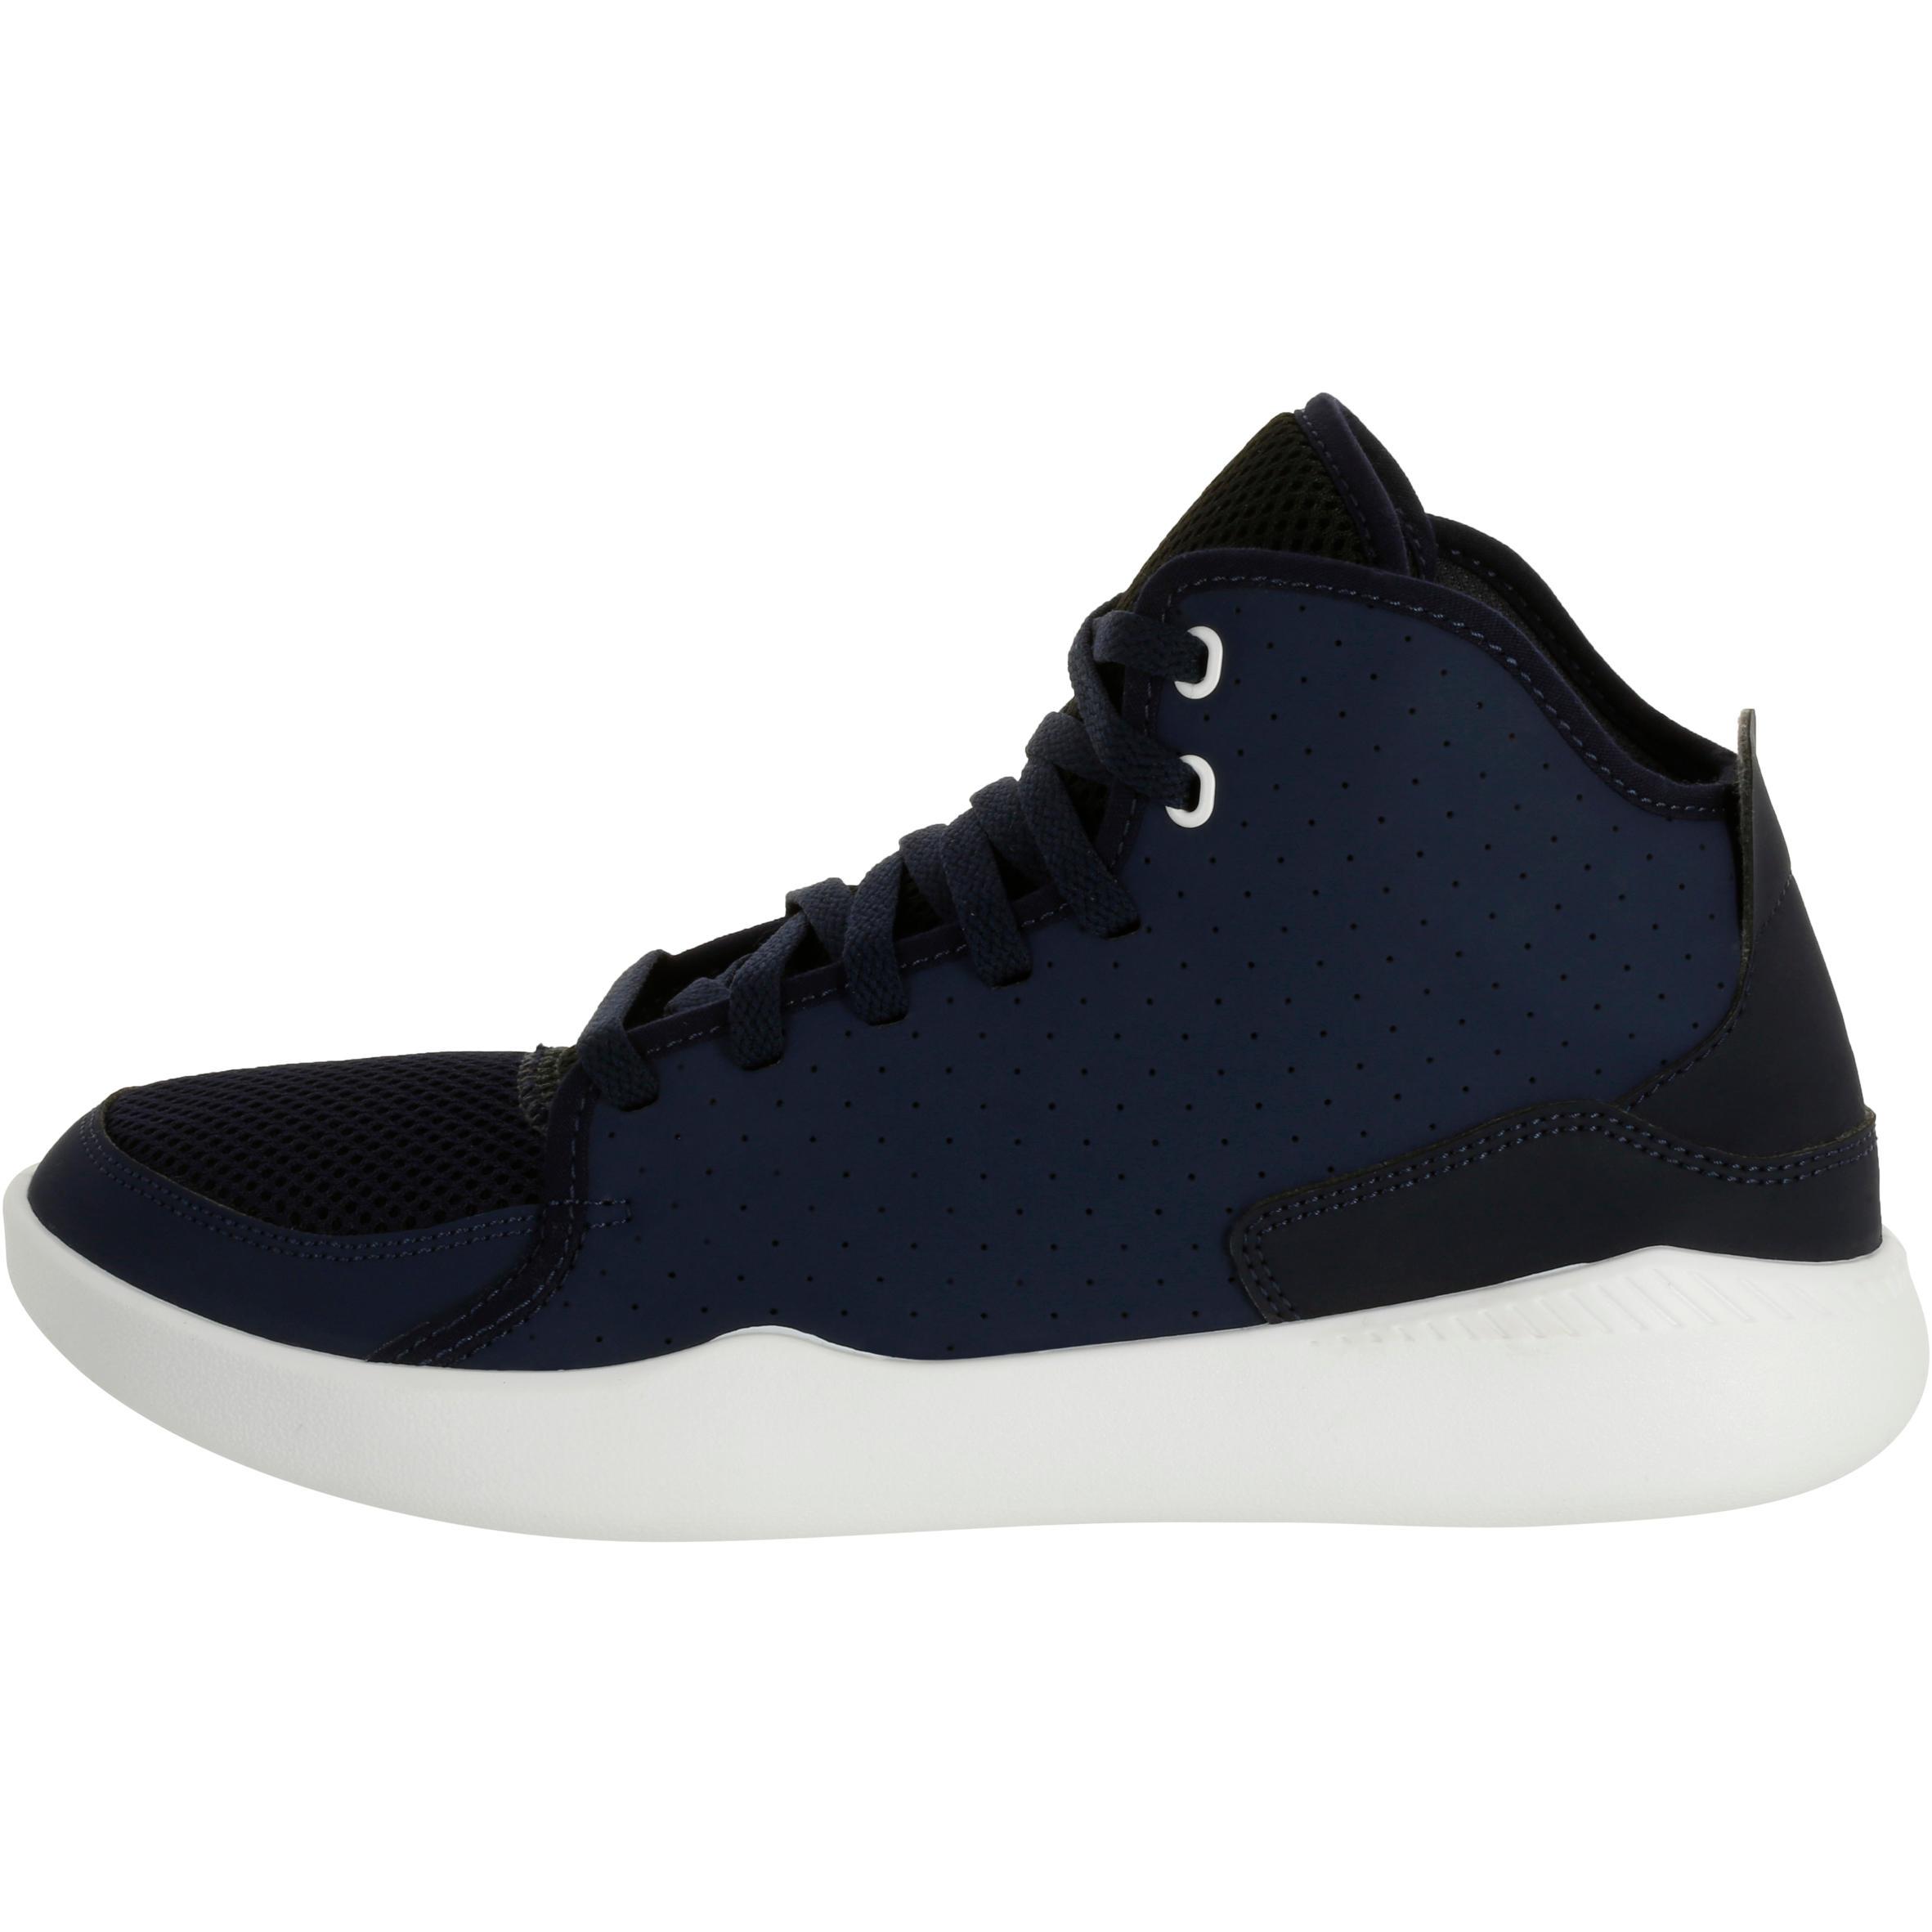 Shield 100 Adult High-Top Beginner Basketball Shoes - Blue